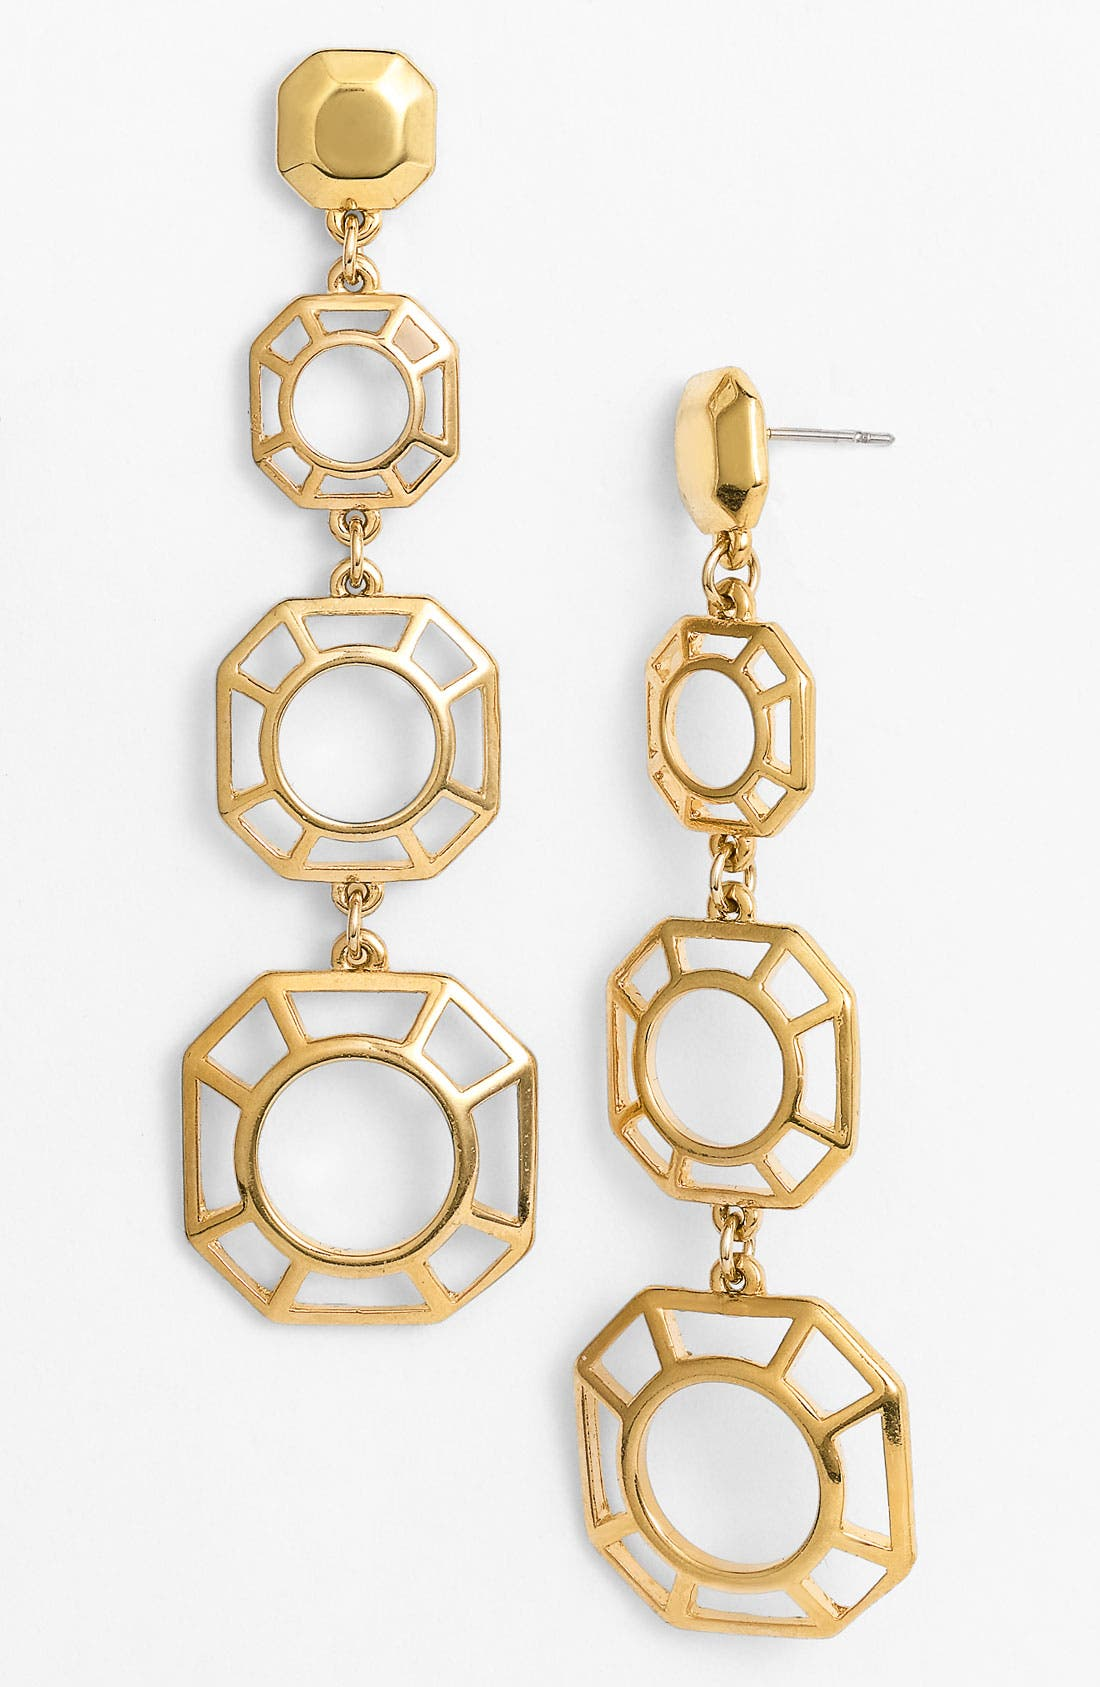 Alternate Image 1 Selected - Tory Burch 'Audrina' Linear Earrings